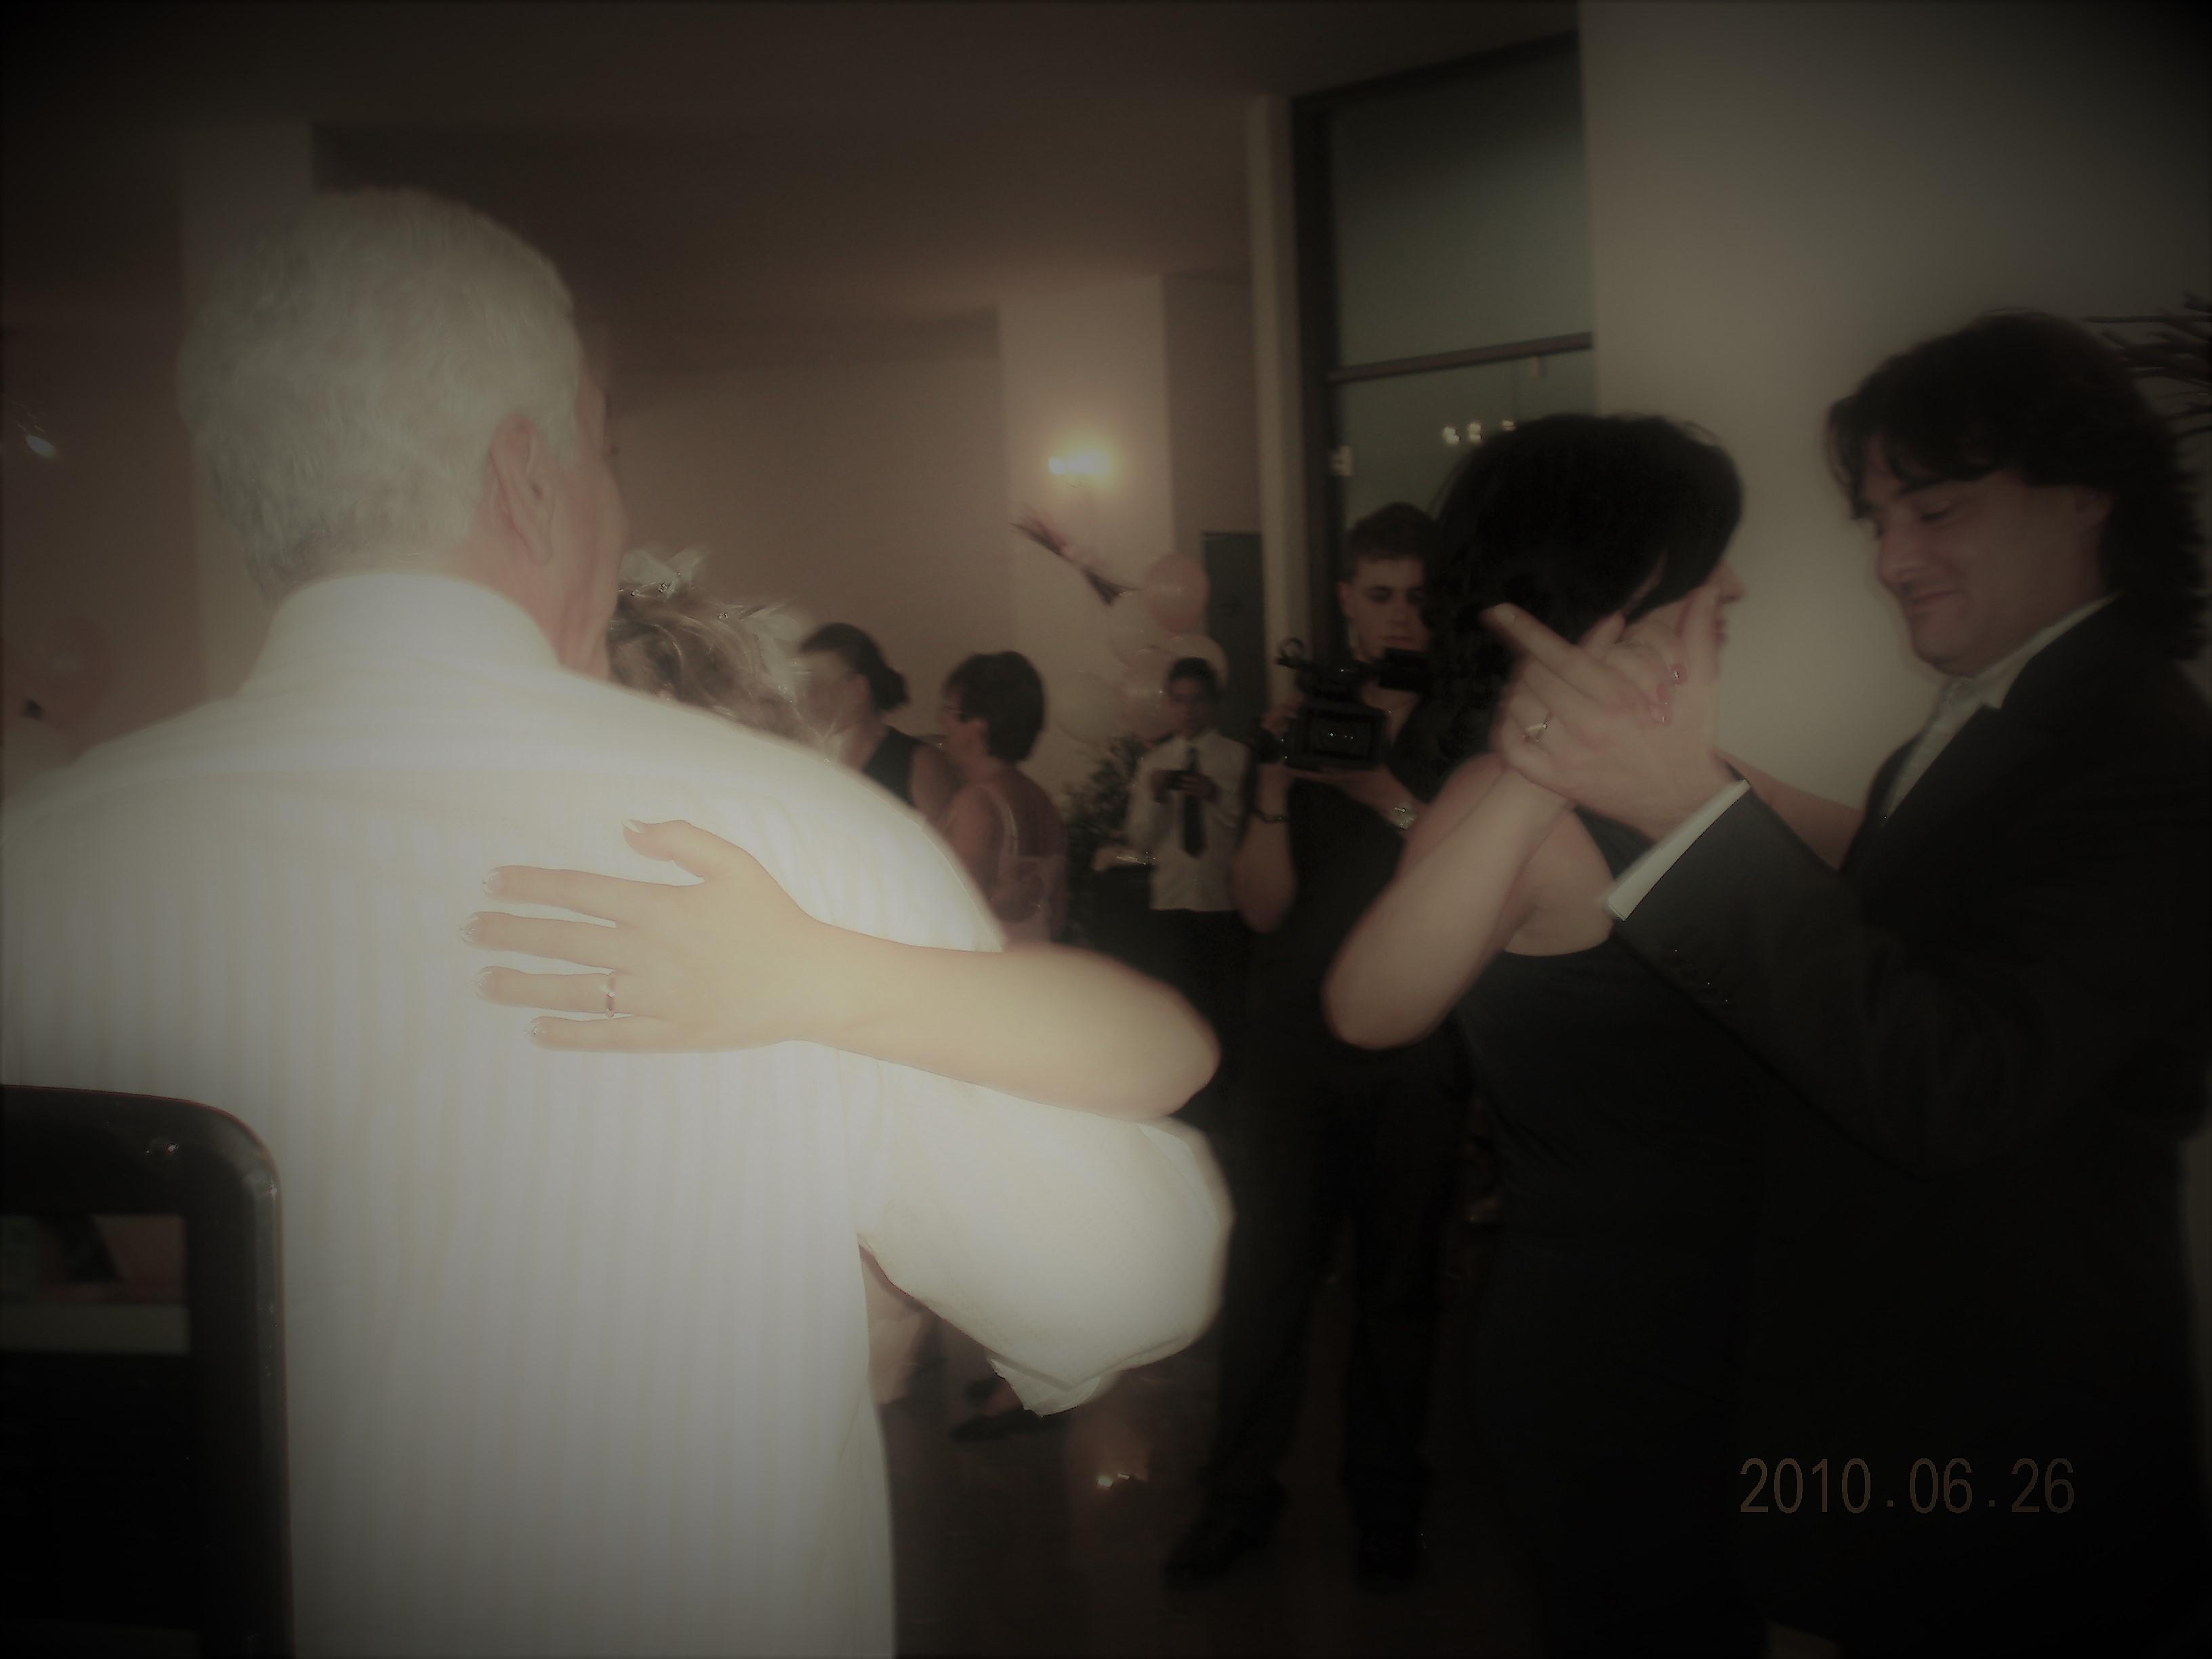 Francesco e Rosanna - 26.06.2010 - 015.JPG